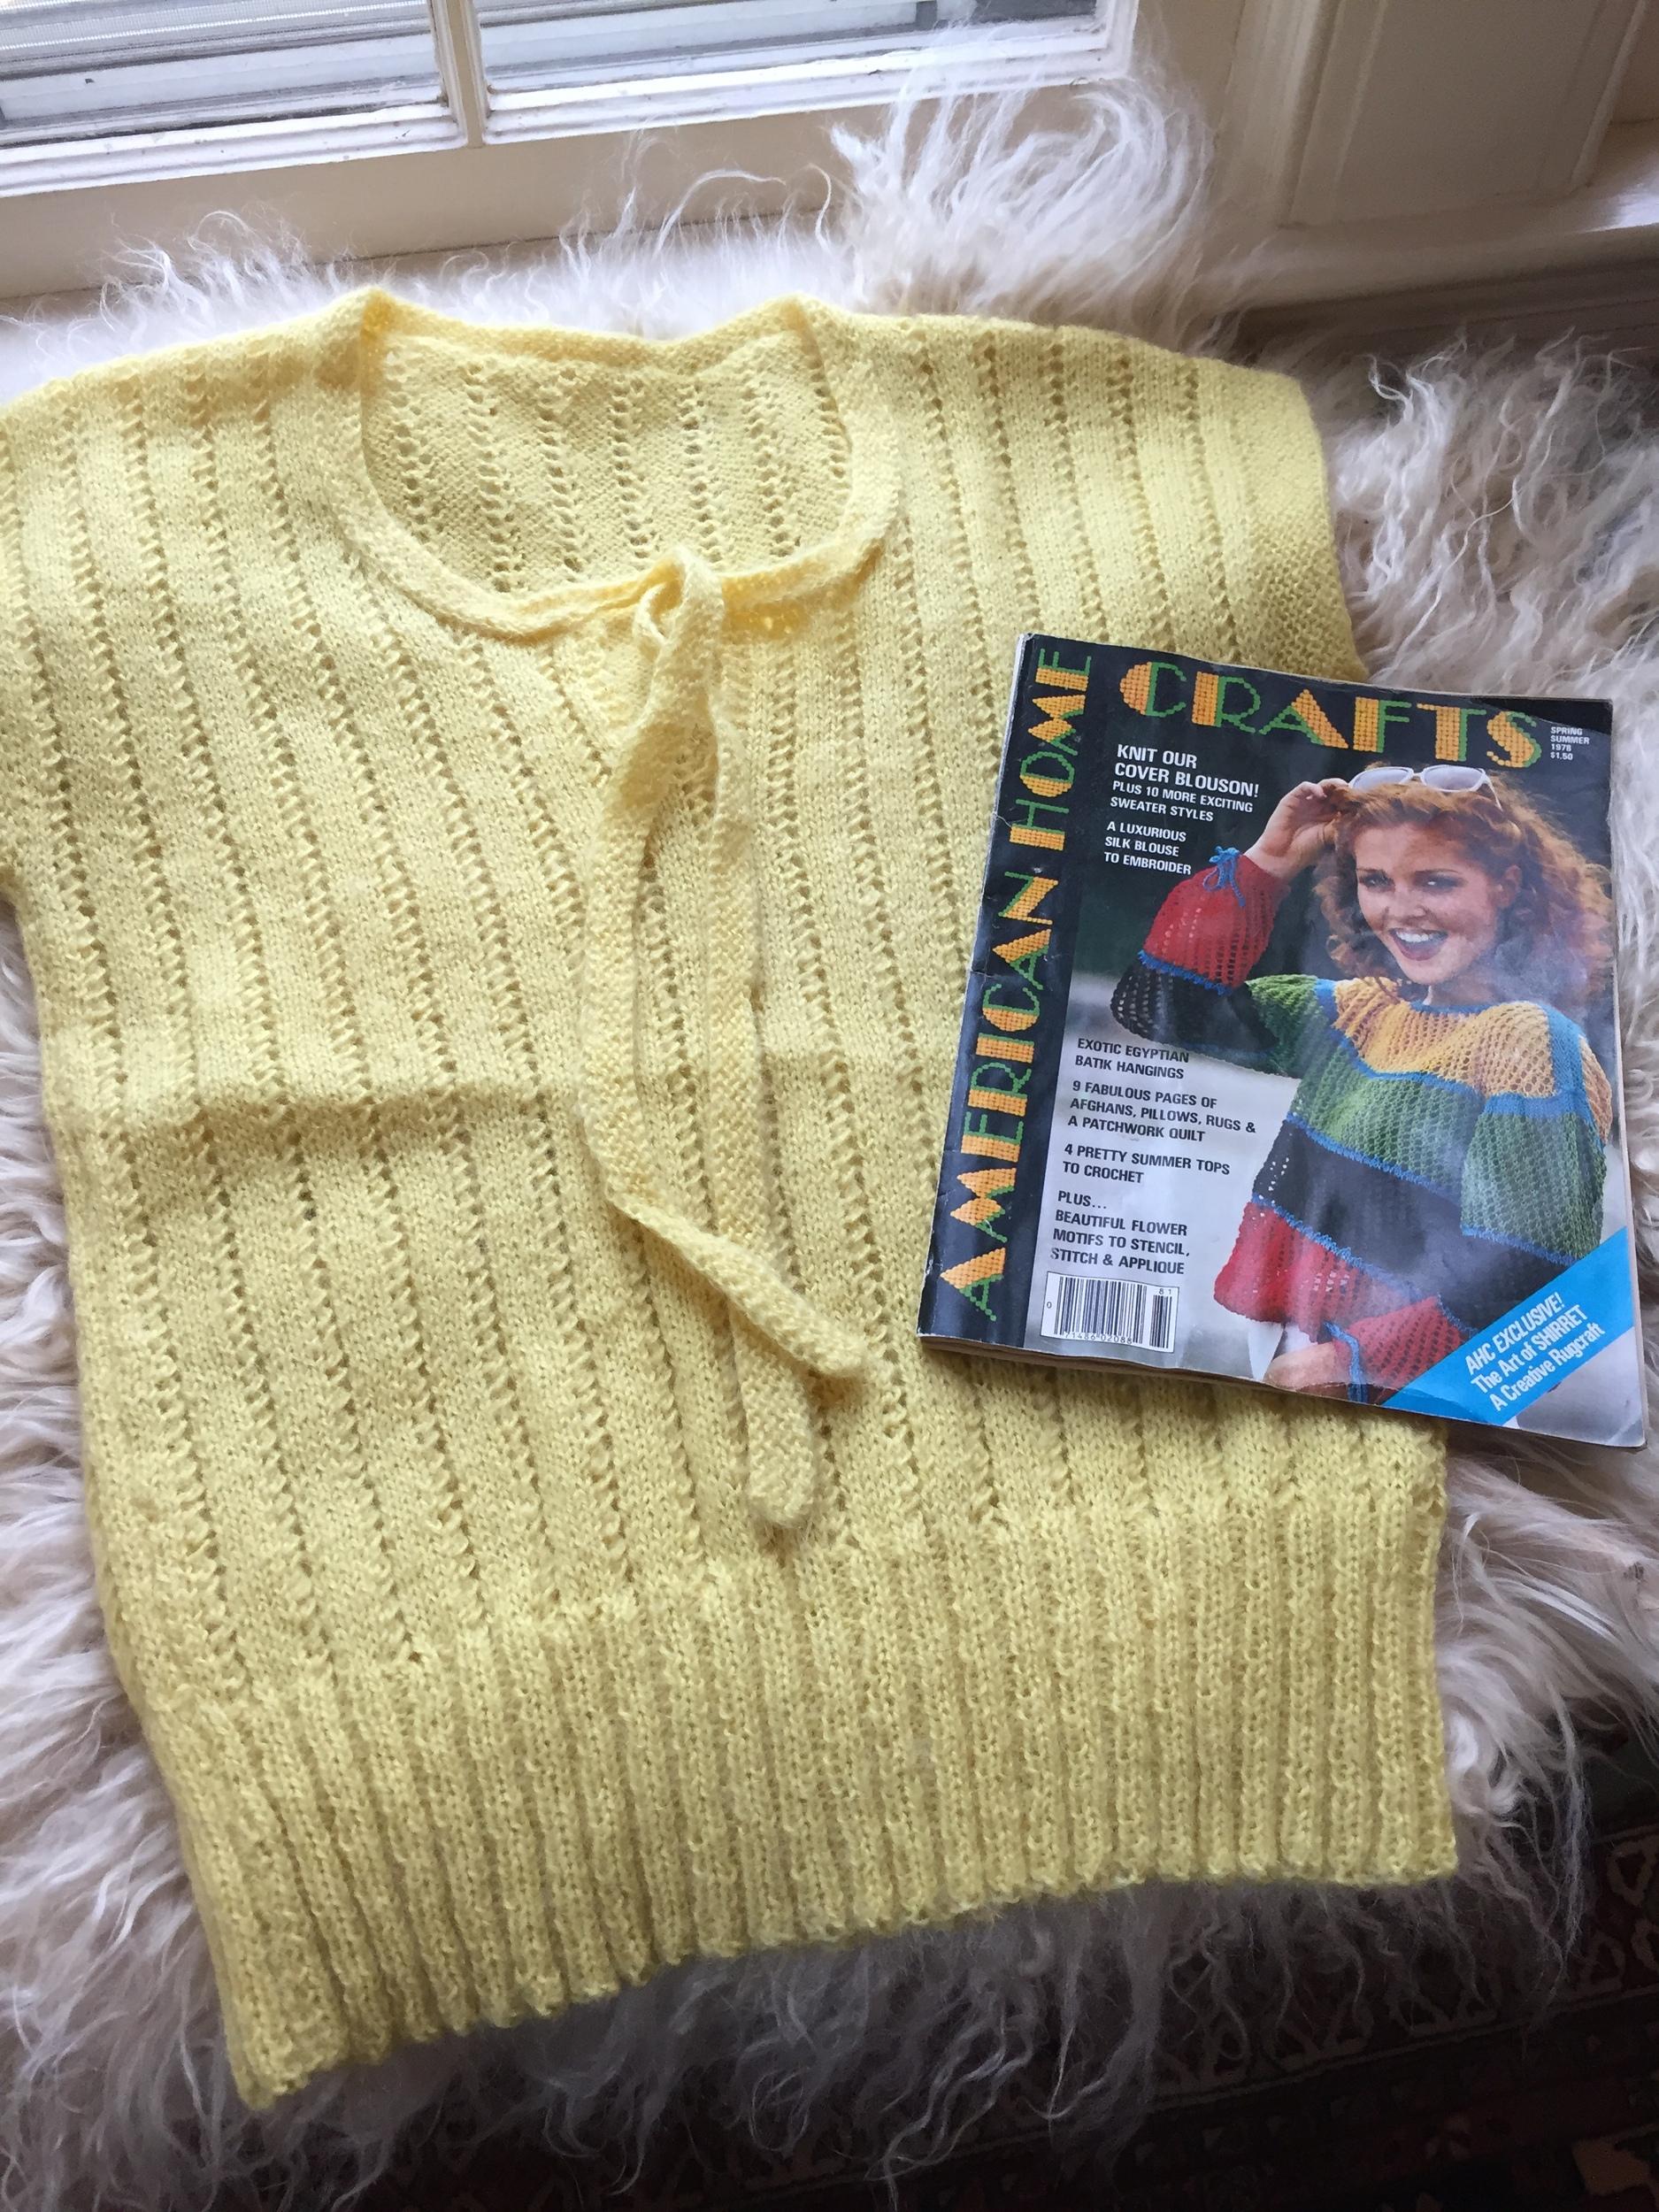 Lindsay_Yellow Sweater_3 of 6.jpg